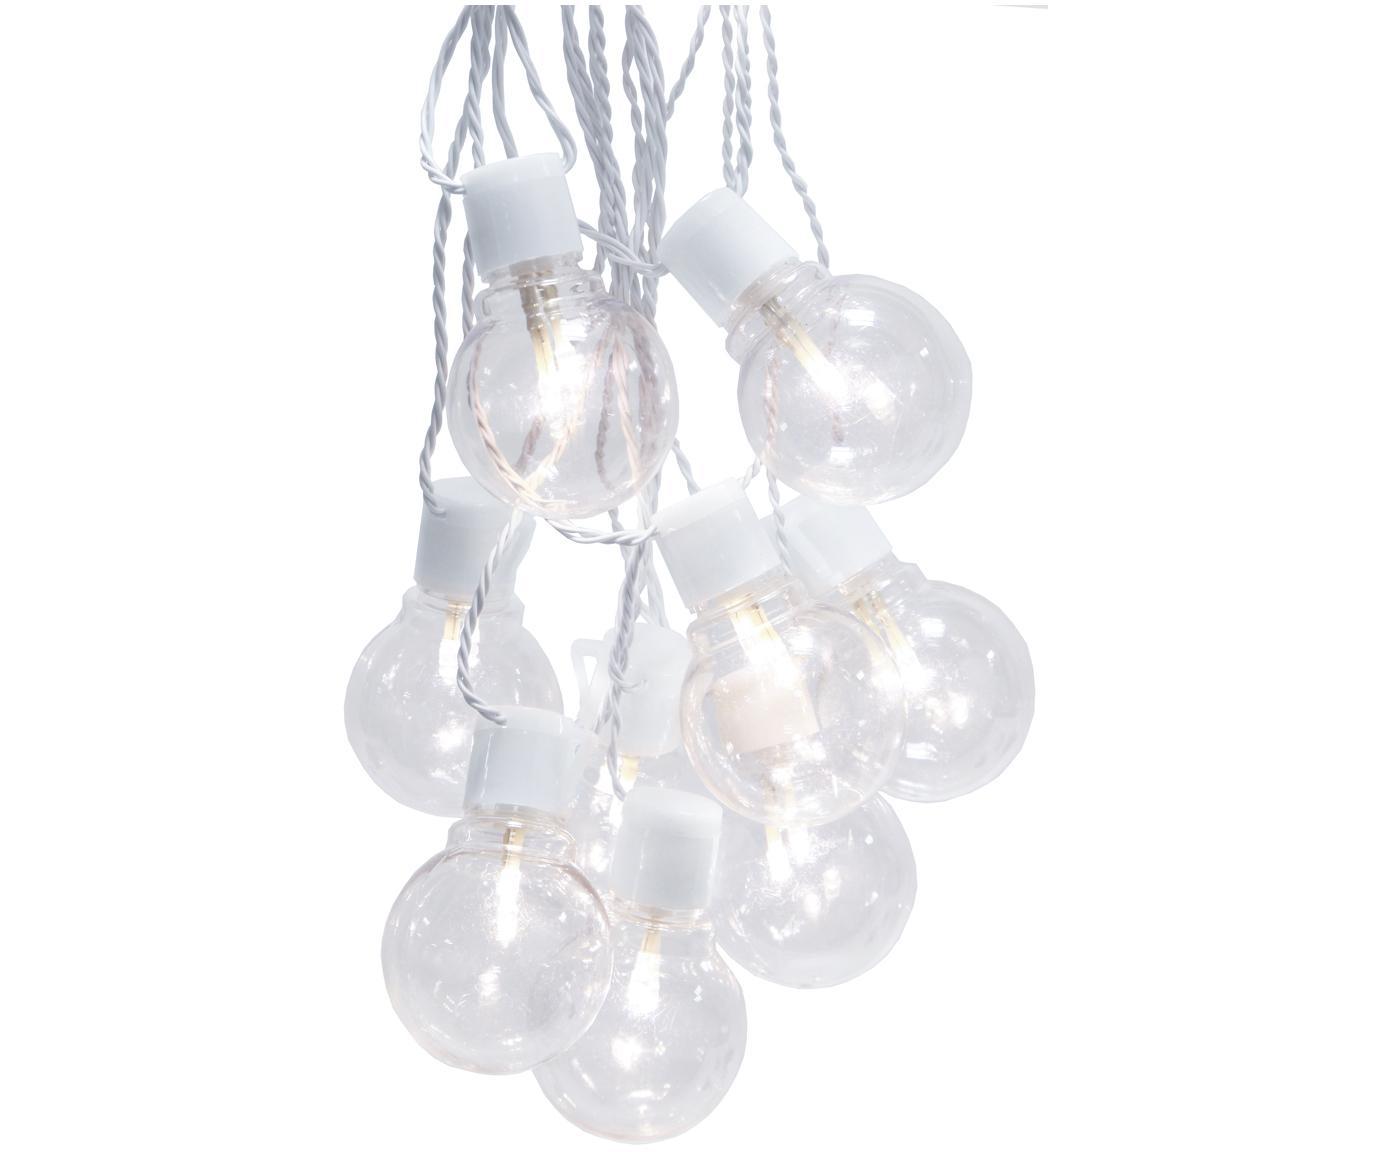 LED lichtslinger Partaj, Wit, L 950 cm